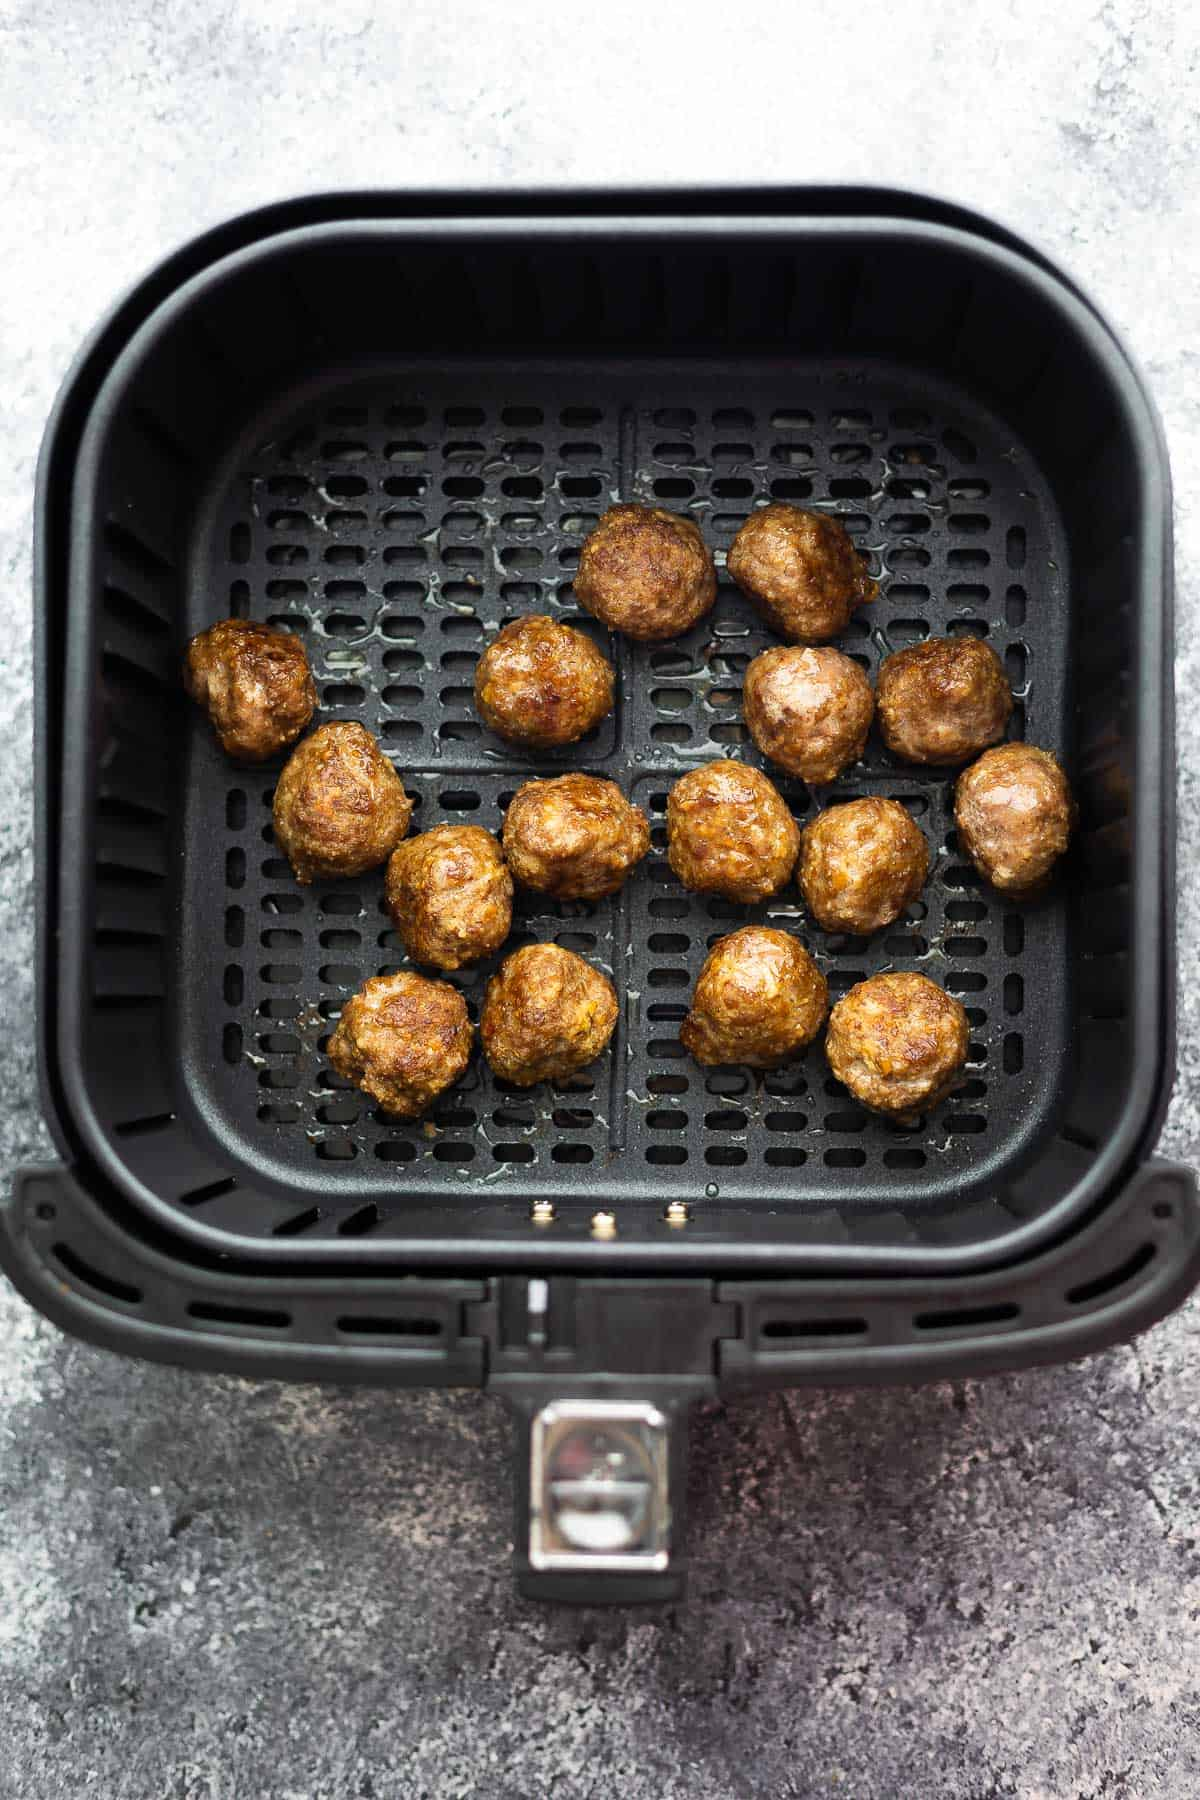 cooked meatballs in air fryer basket